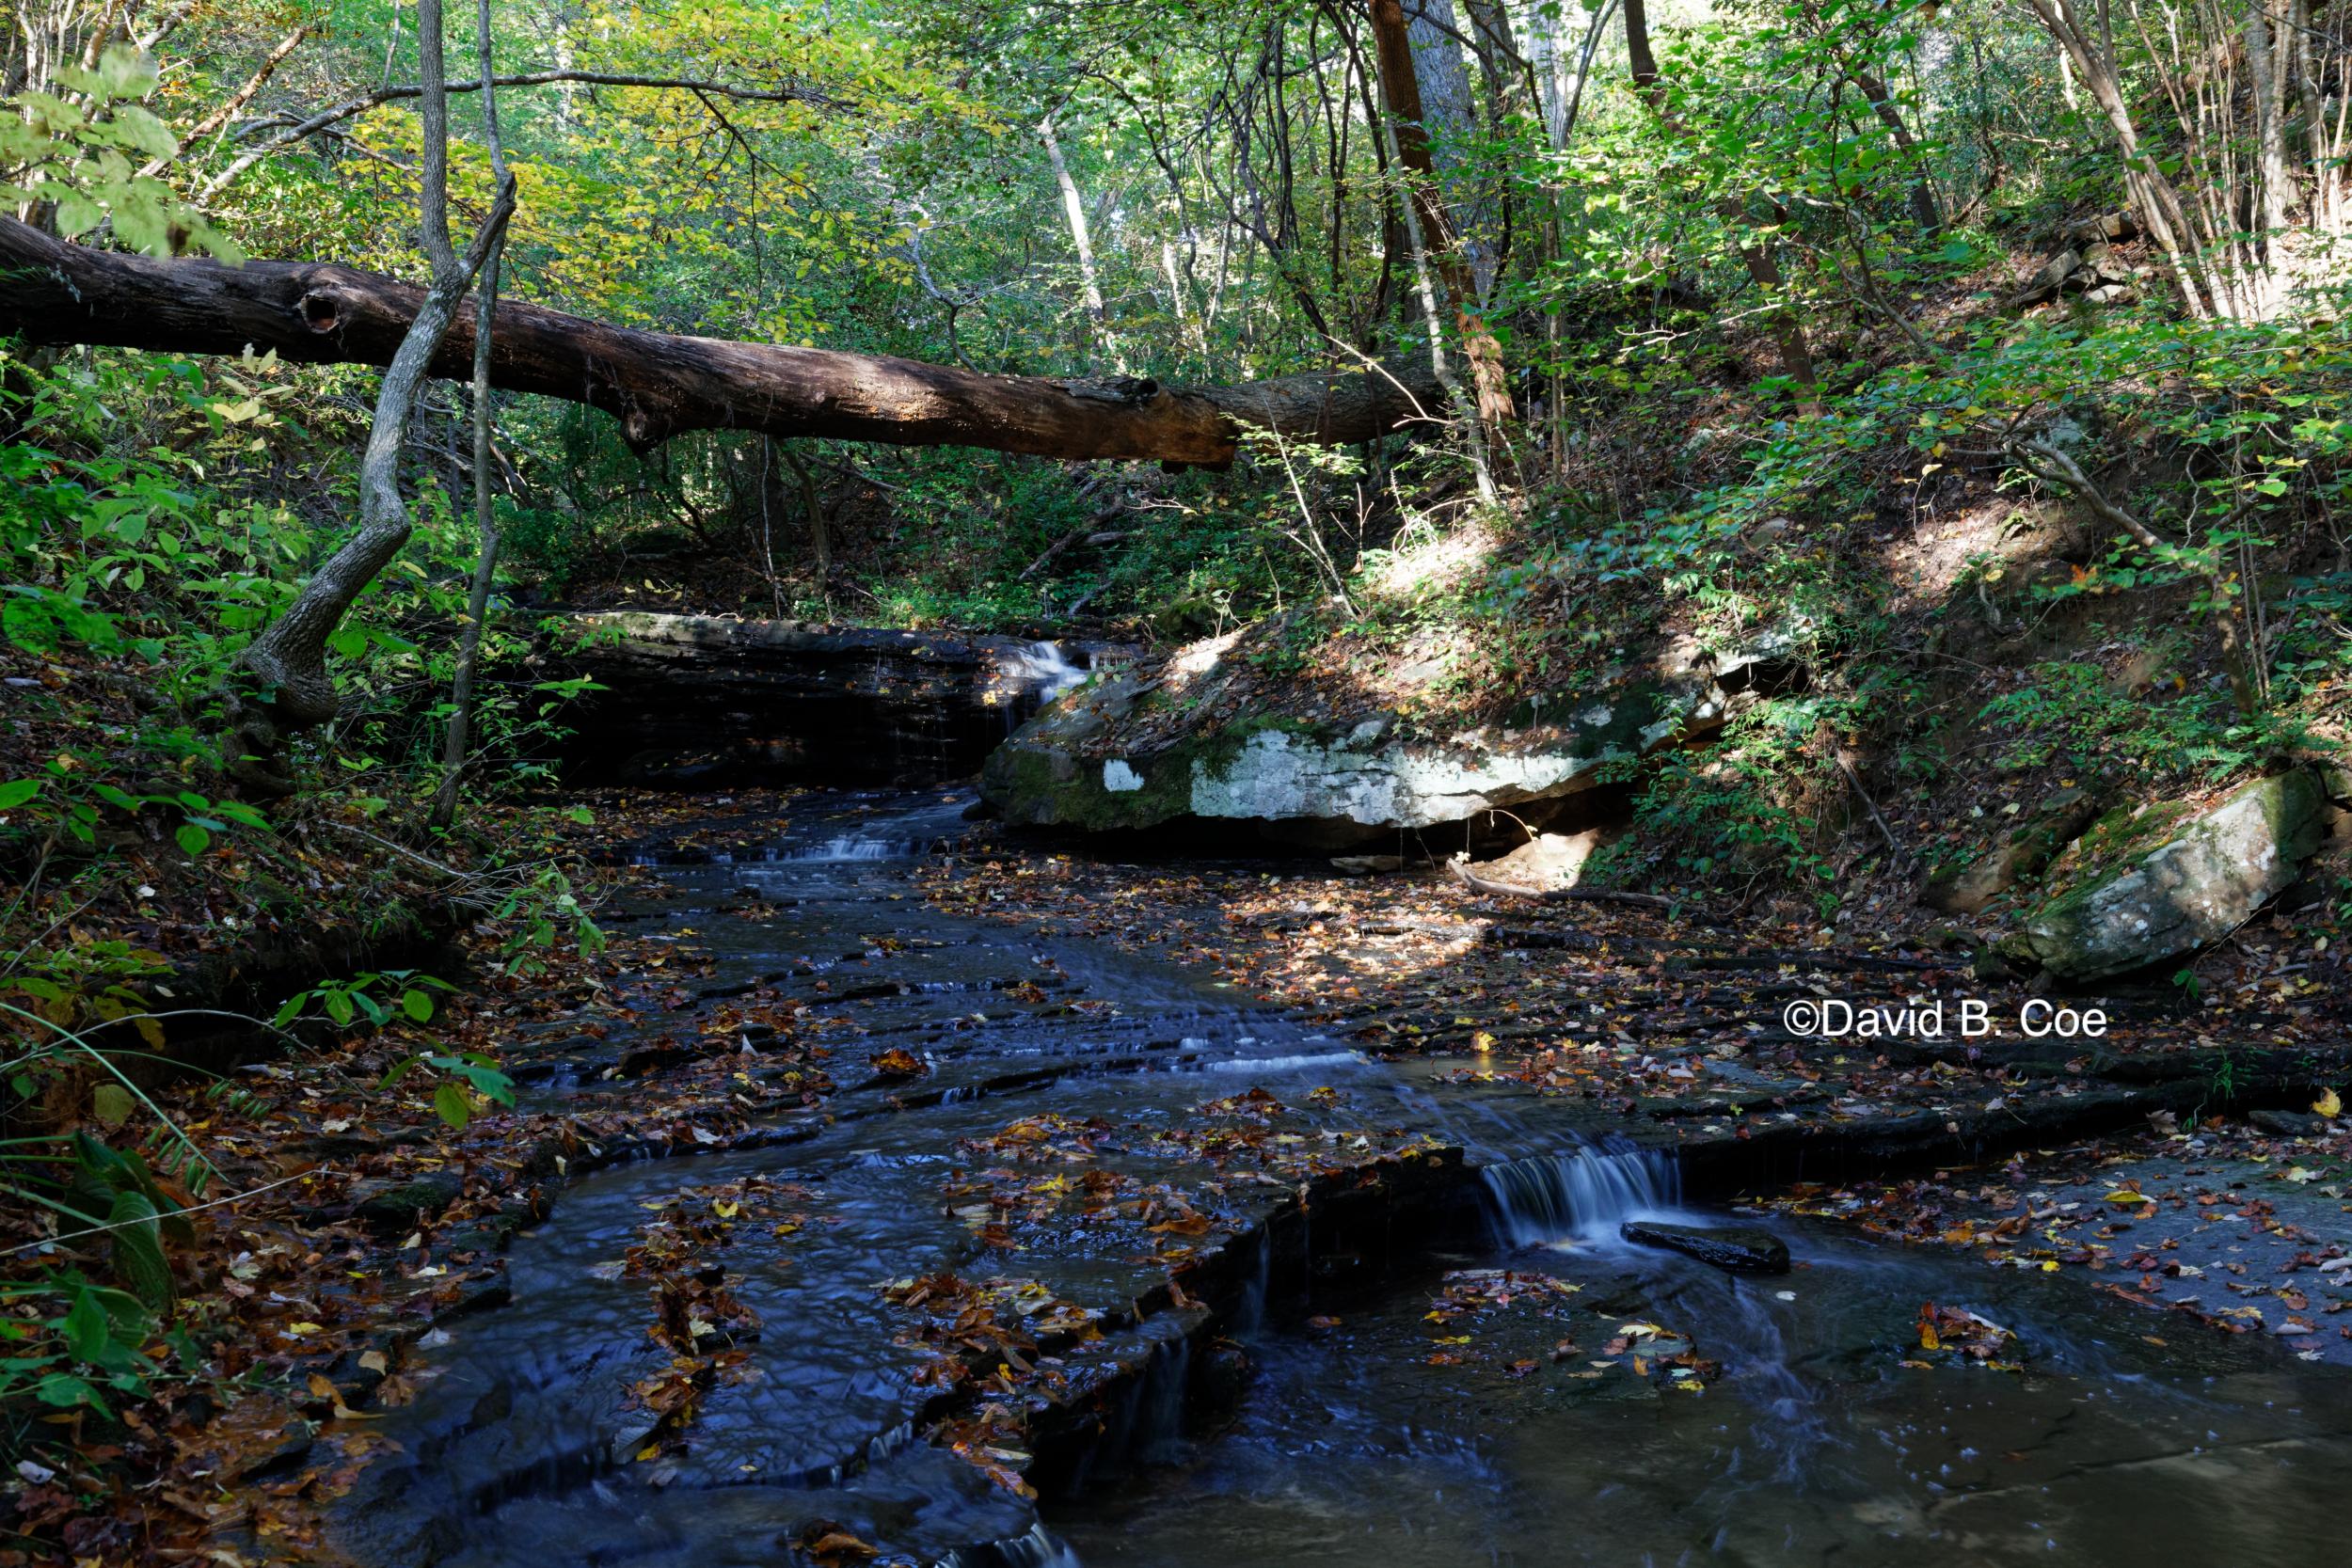 Morgan's Steep Stream, Fall, by David B. Coe